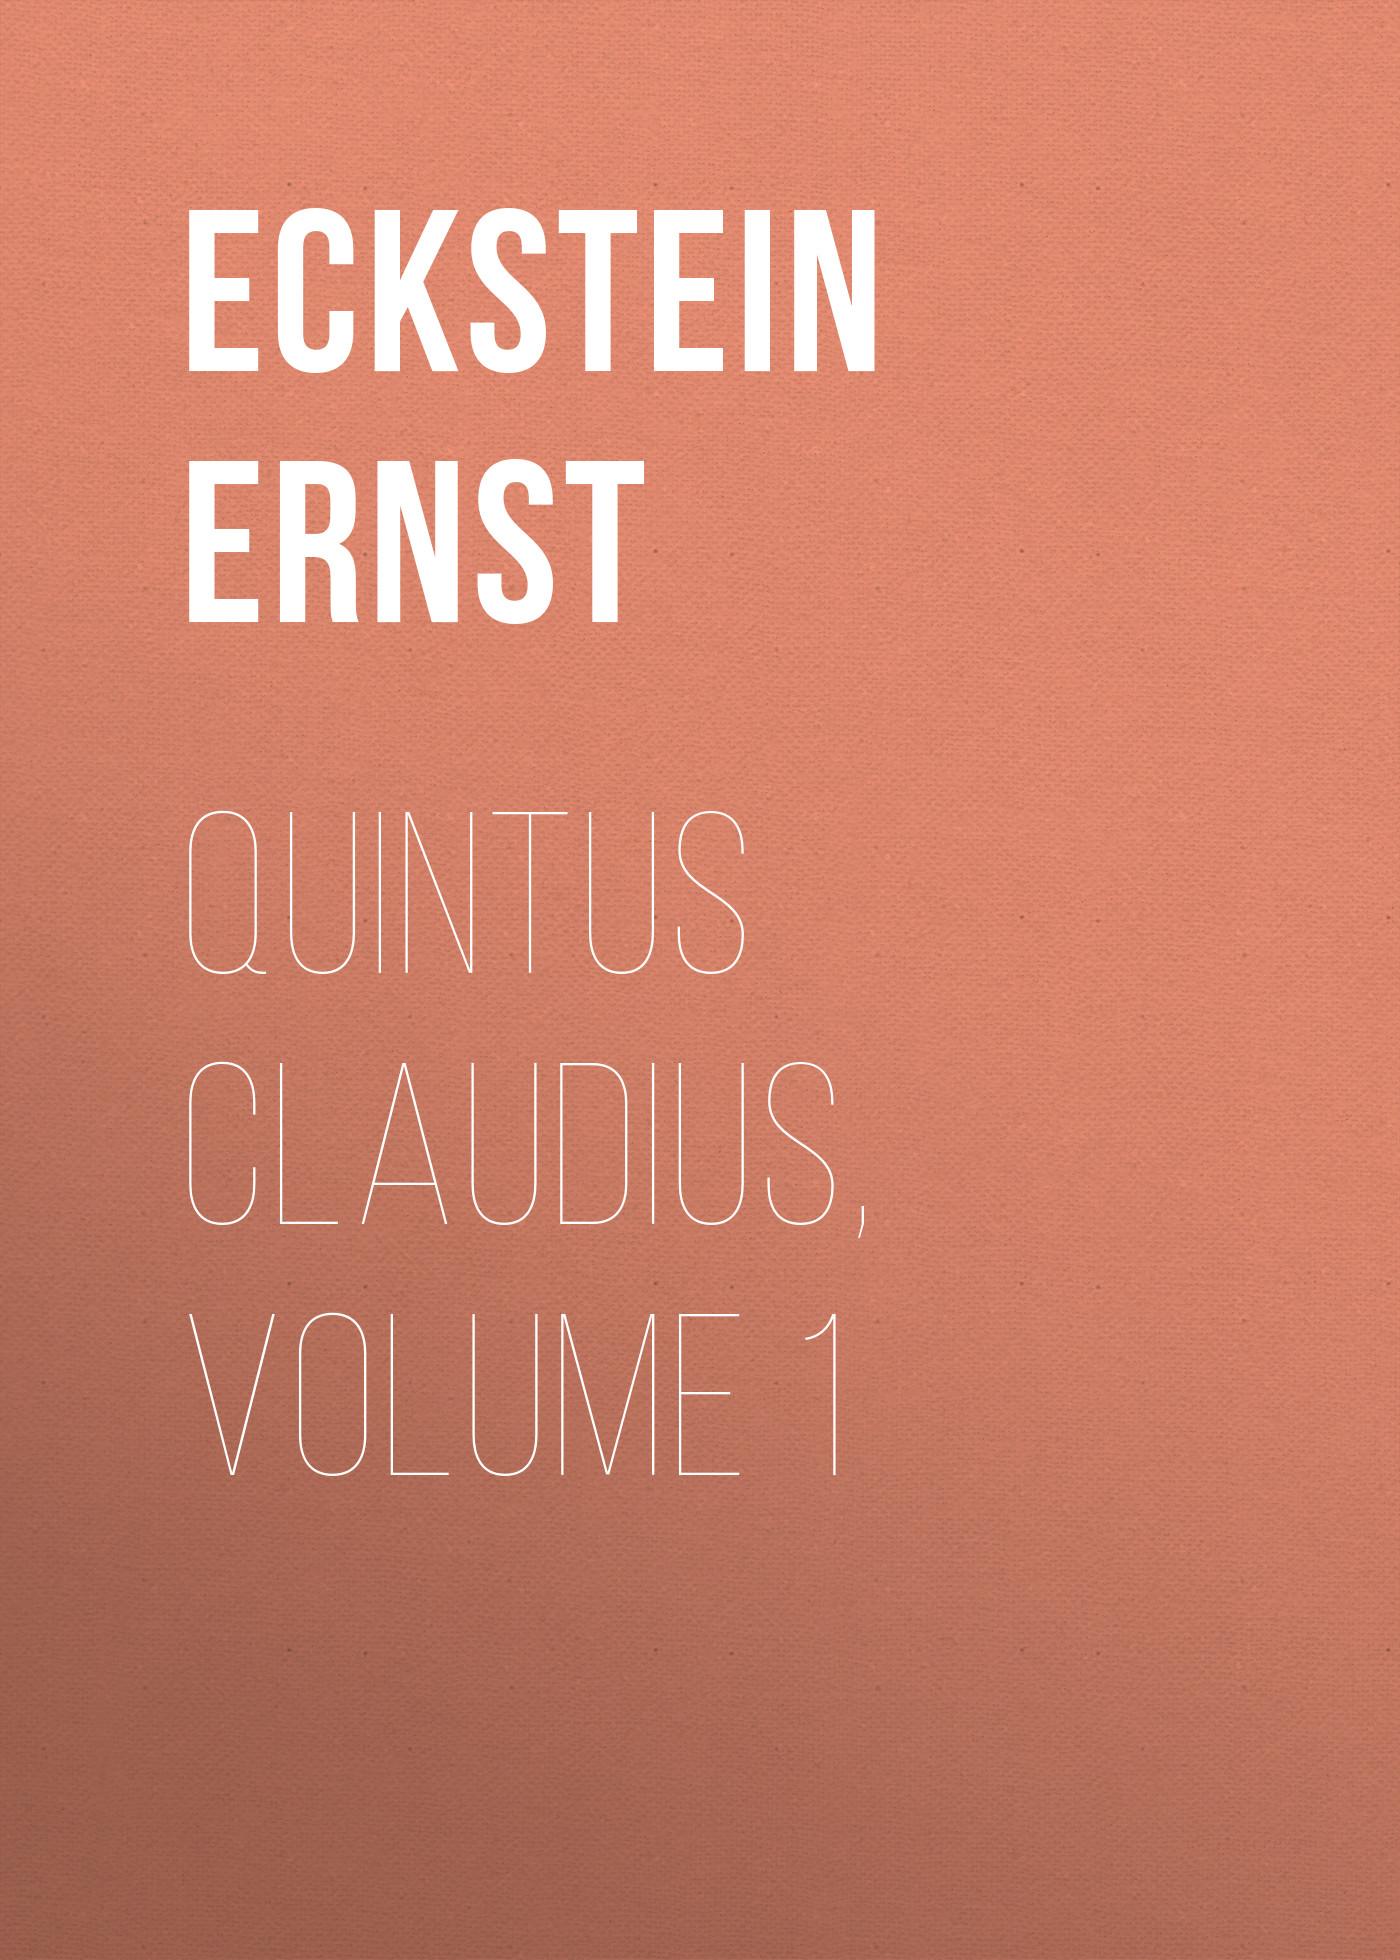 Eckstein Ernst Quintus Claudius, Volume 1 sport yoga pants high waist yoga pants for women soft sports pants hollow out seamless leggings workout running leggings tights